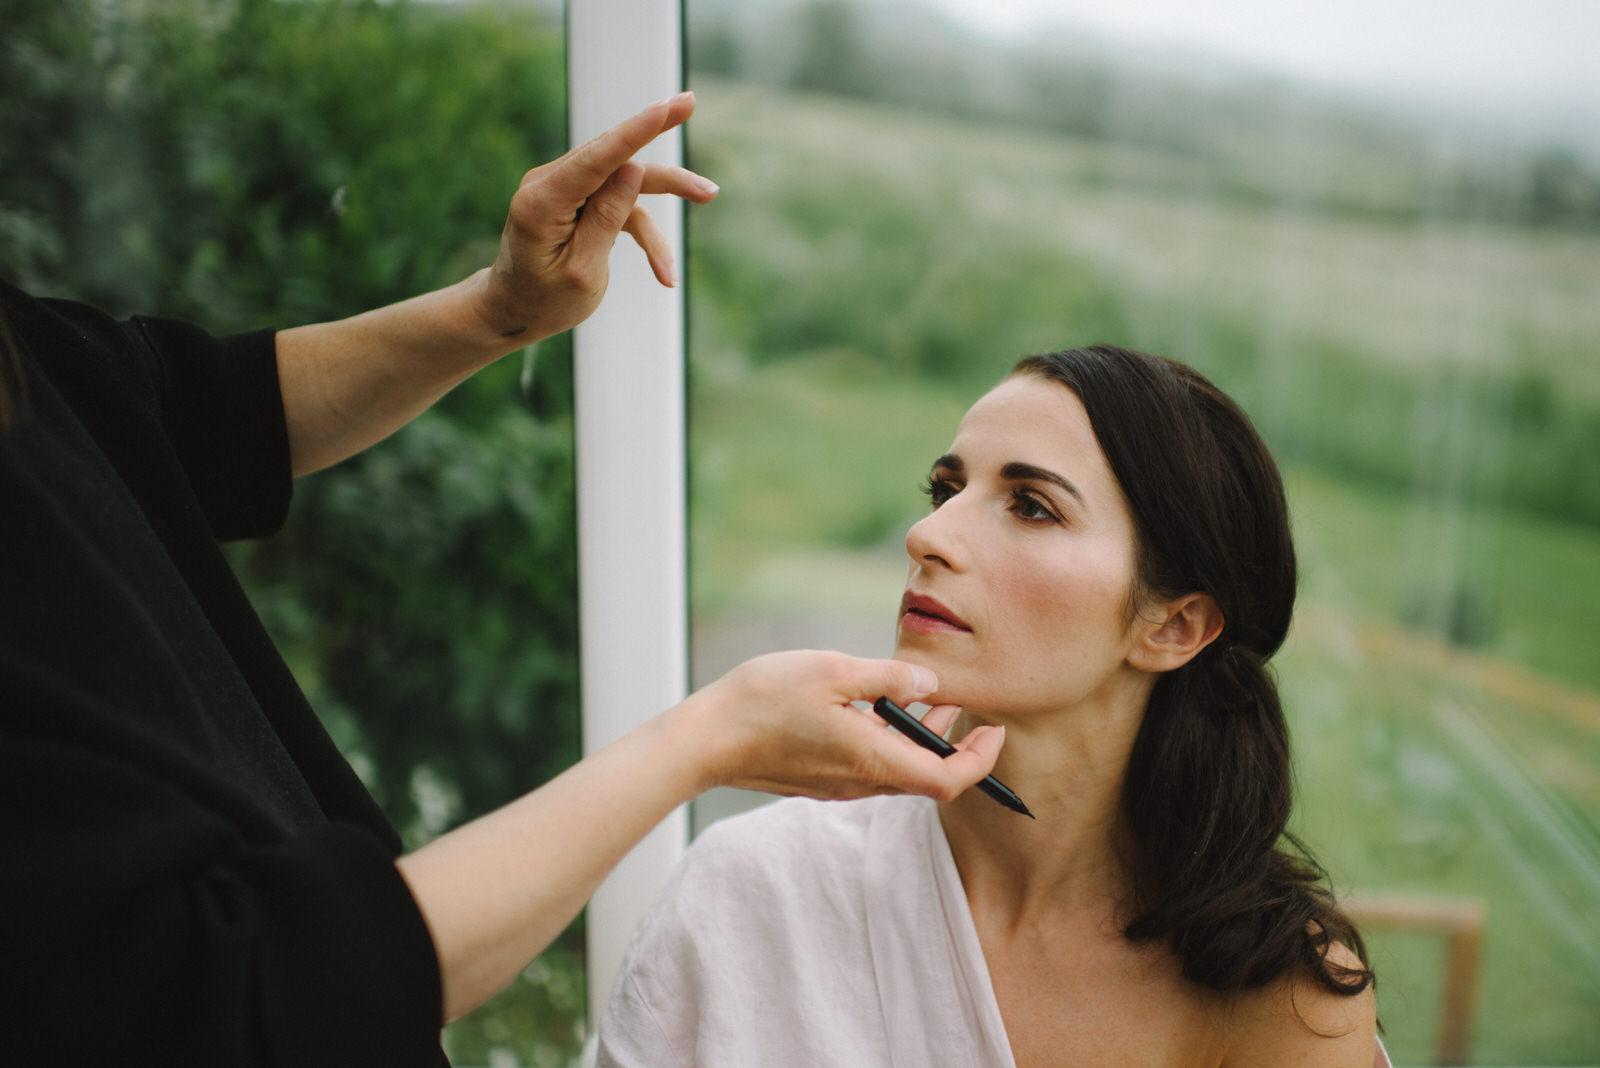 018-GUARDSWELL-FARM-WEDDING-ALTERNATIVE-SCOTTISH-WEDDING-PHOTOGRAPHER-SCOTTISH-WEDDING-DESTINATION-WEDDING-PHOTOGRAPHER.JPG